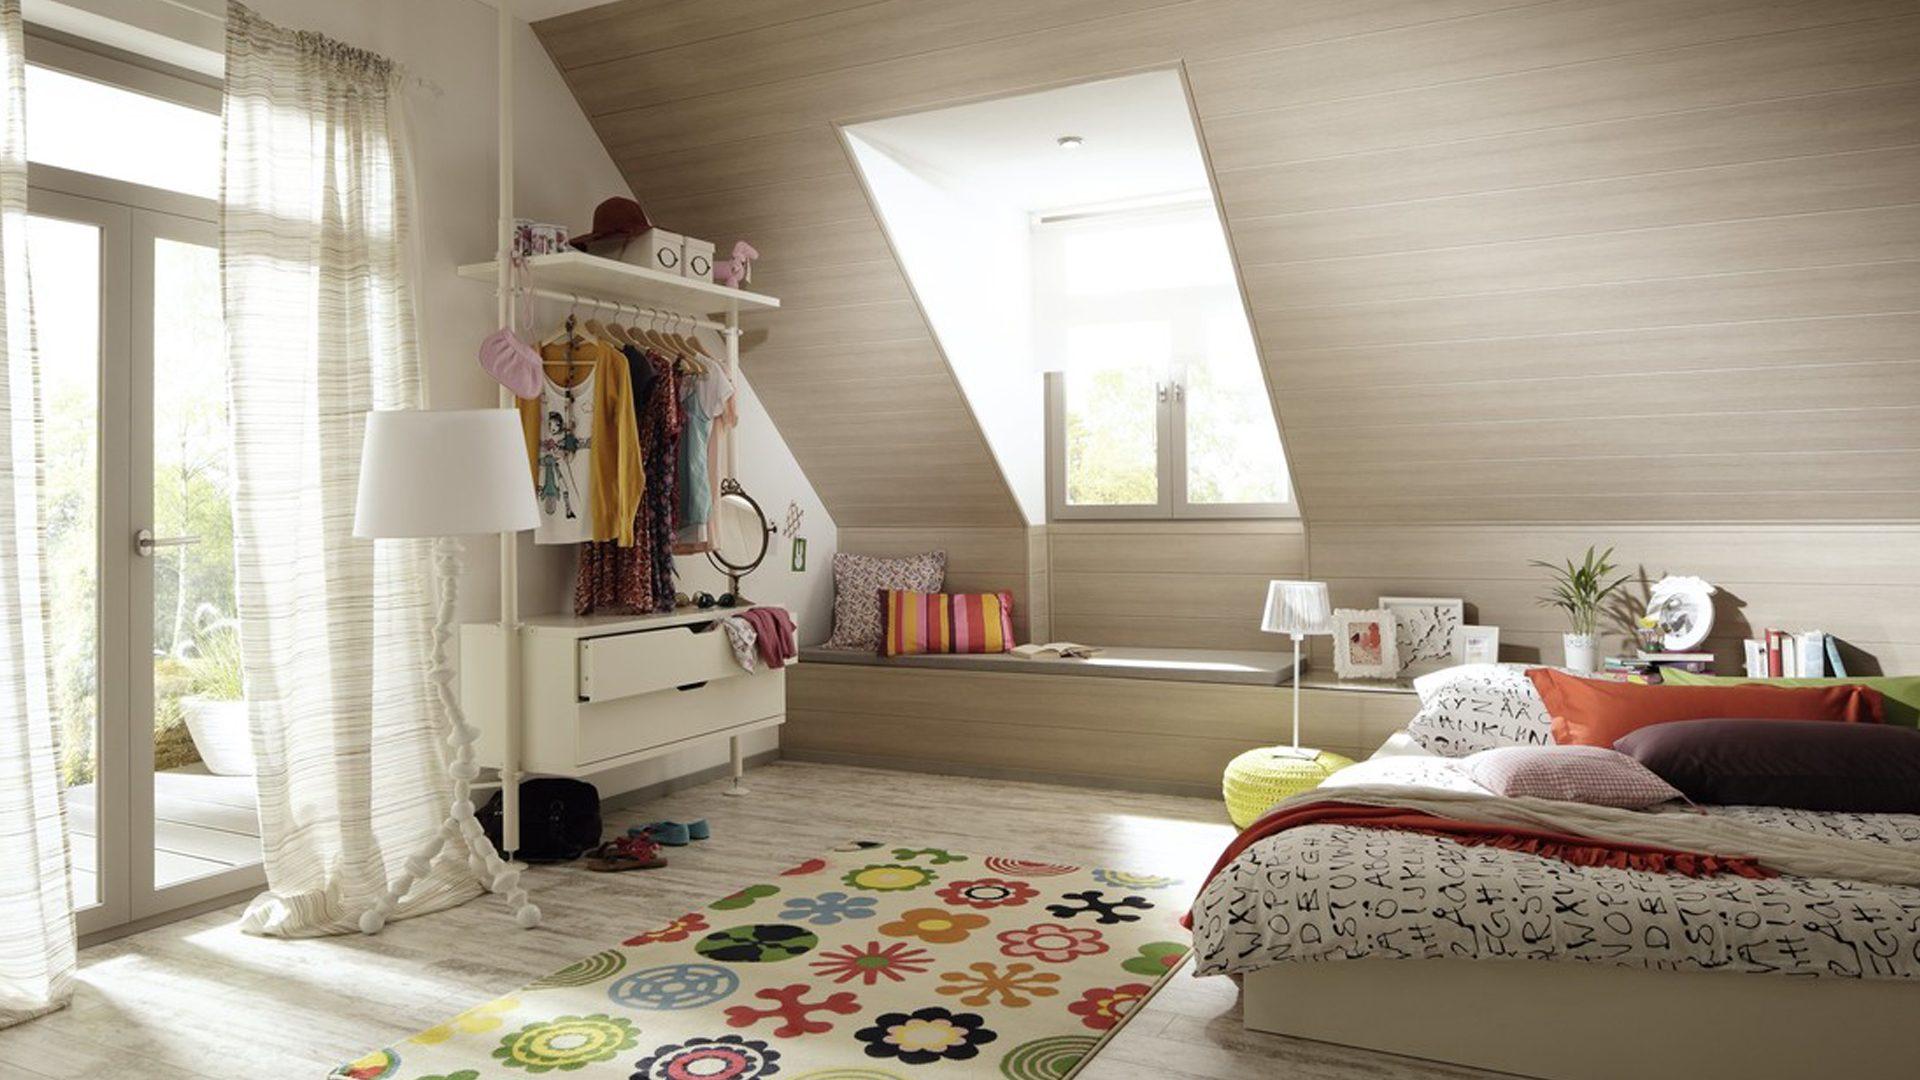 Paneelen, Decken, Wand, Spaltholz